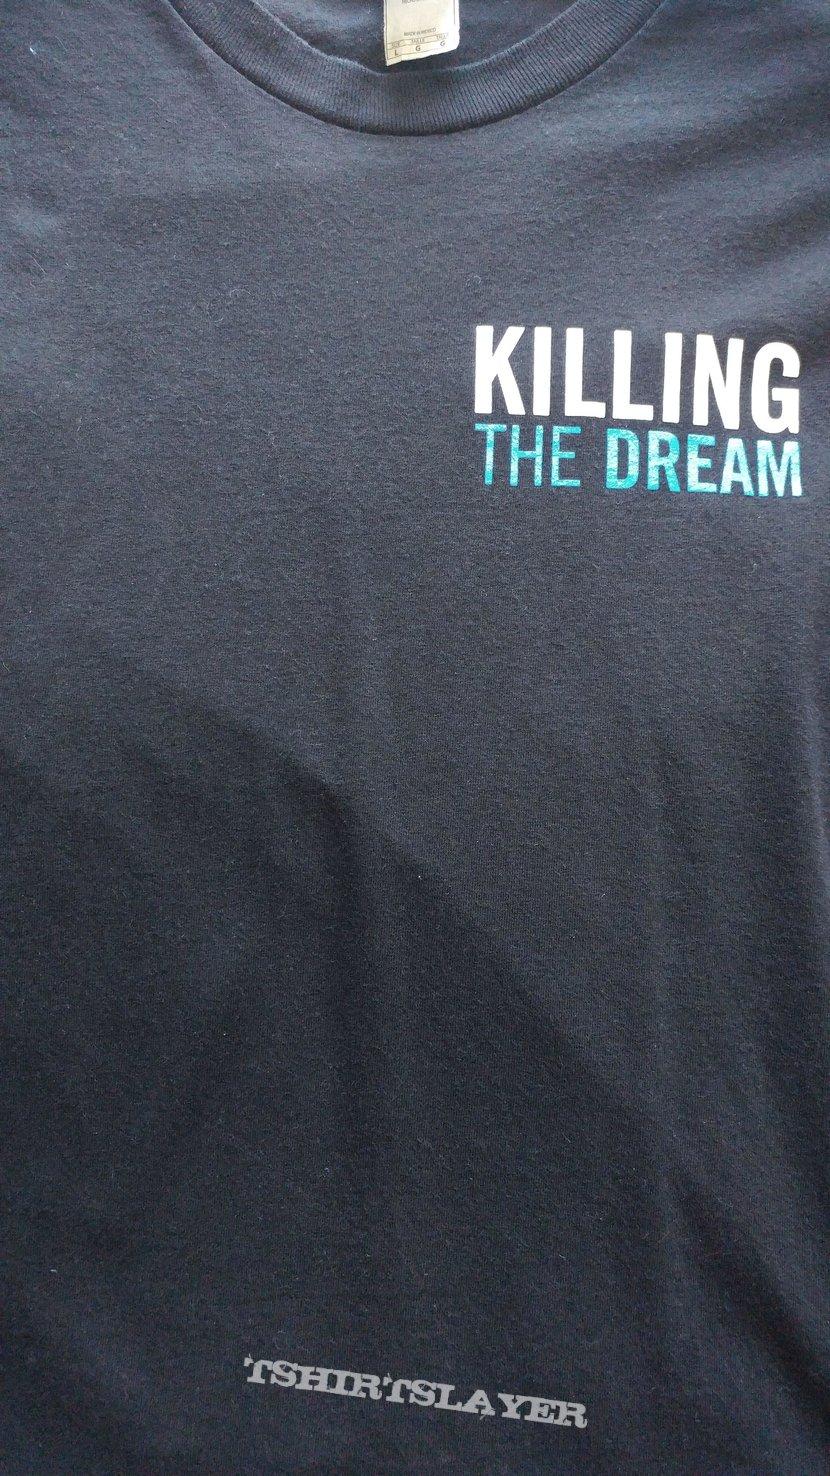 Killing the Dream Fractures overcast shirt